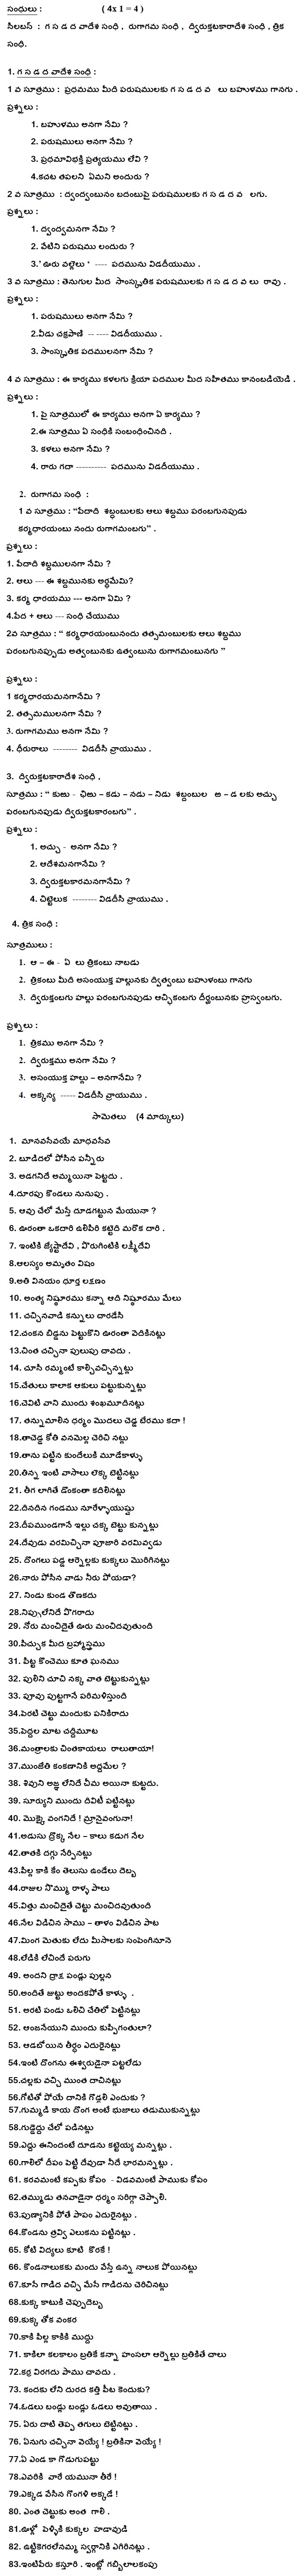 CBSE Class 10 Question Bank - Telugu | AglaSem Schools